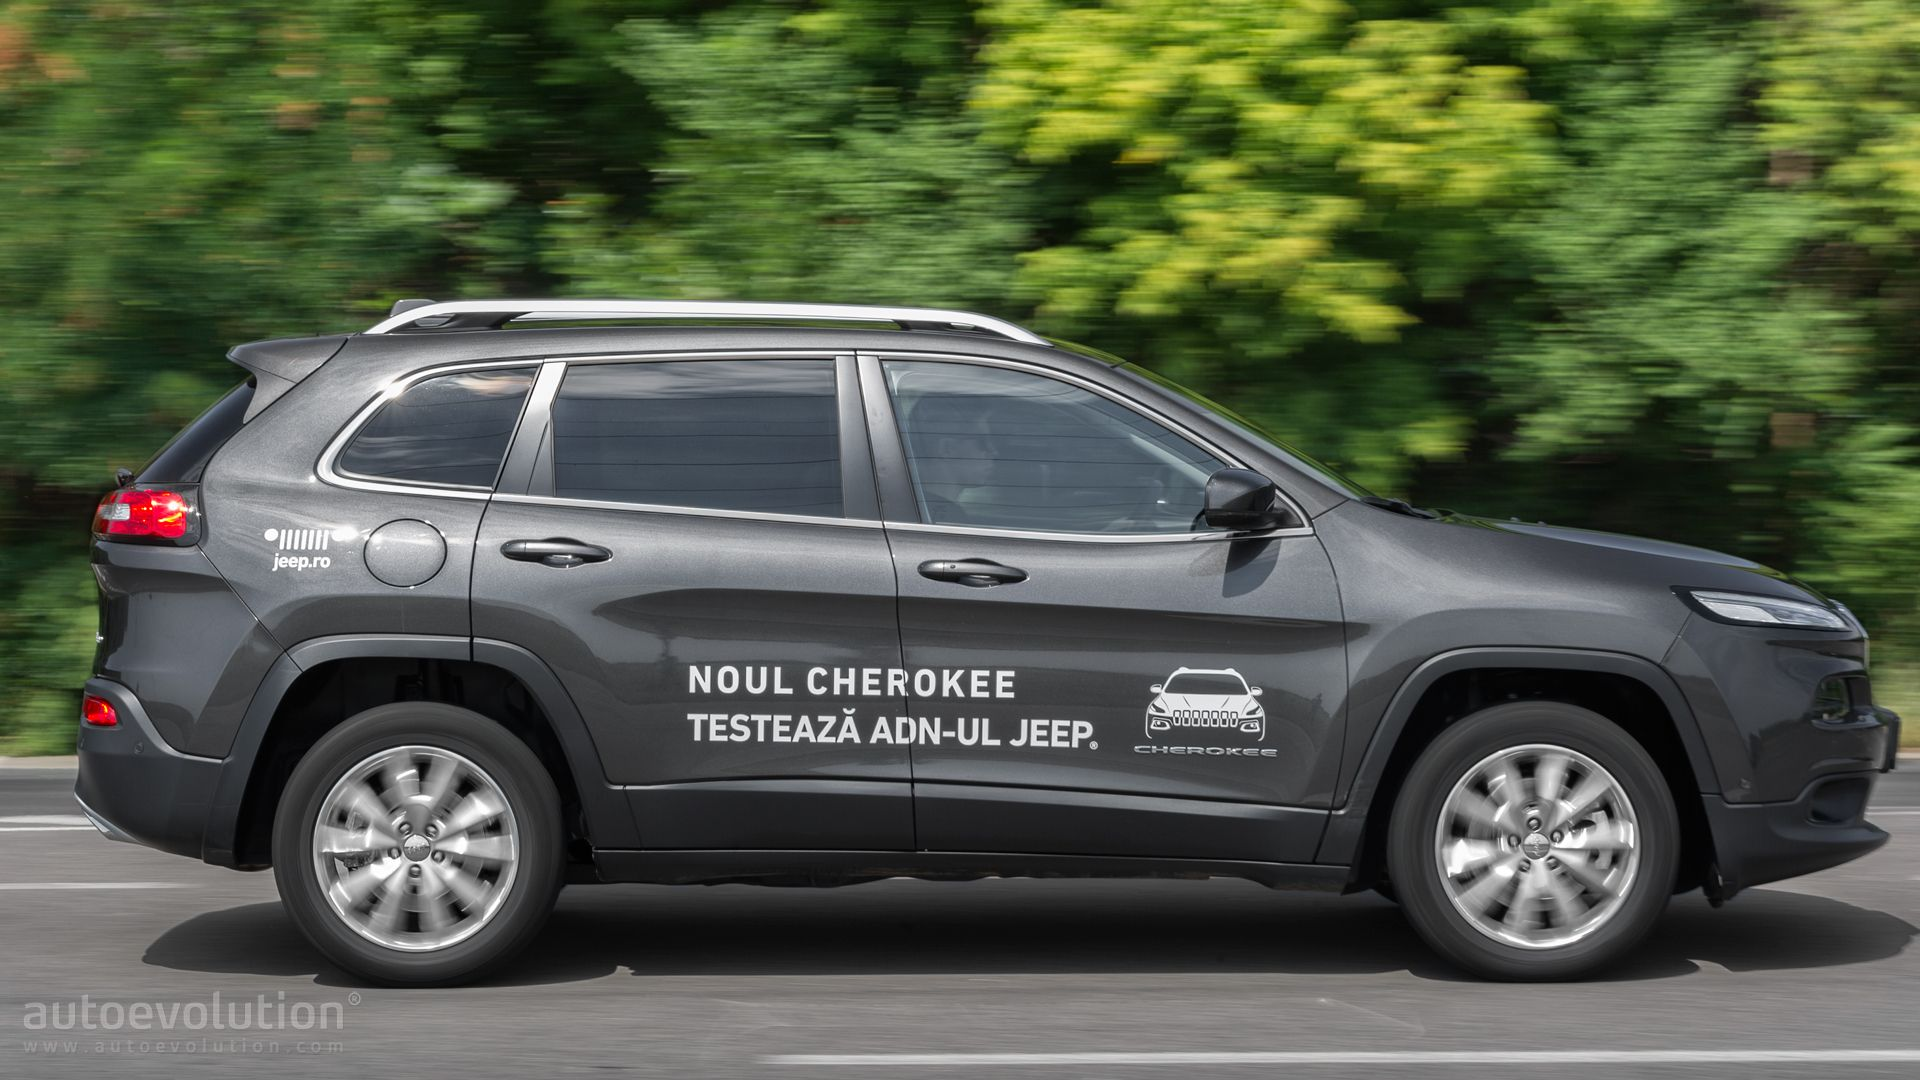 2015 jeep cherokee disel mpg autos post. Black Bedroom Furniture Sets. Home Design Ideas